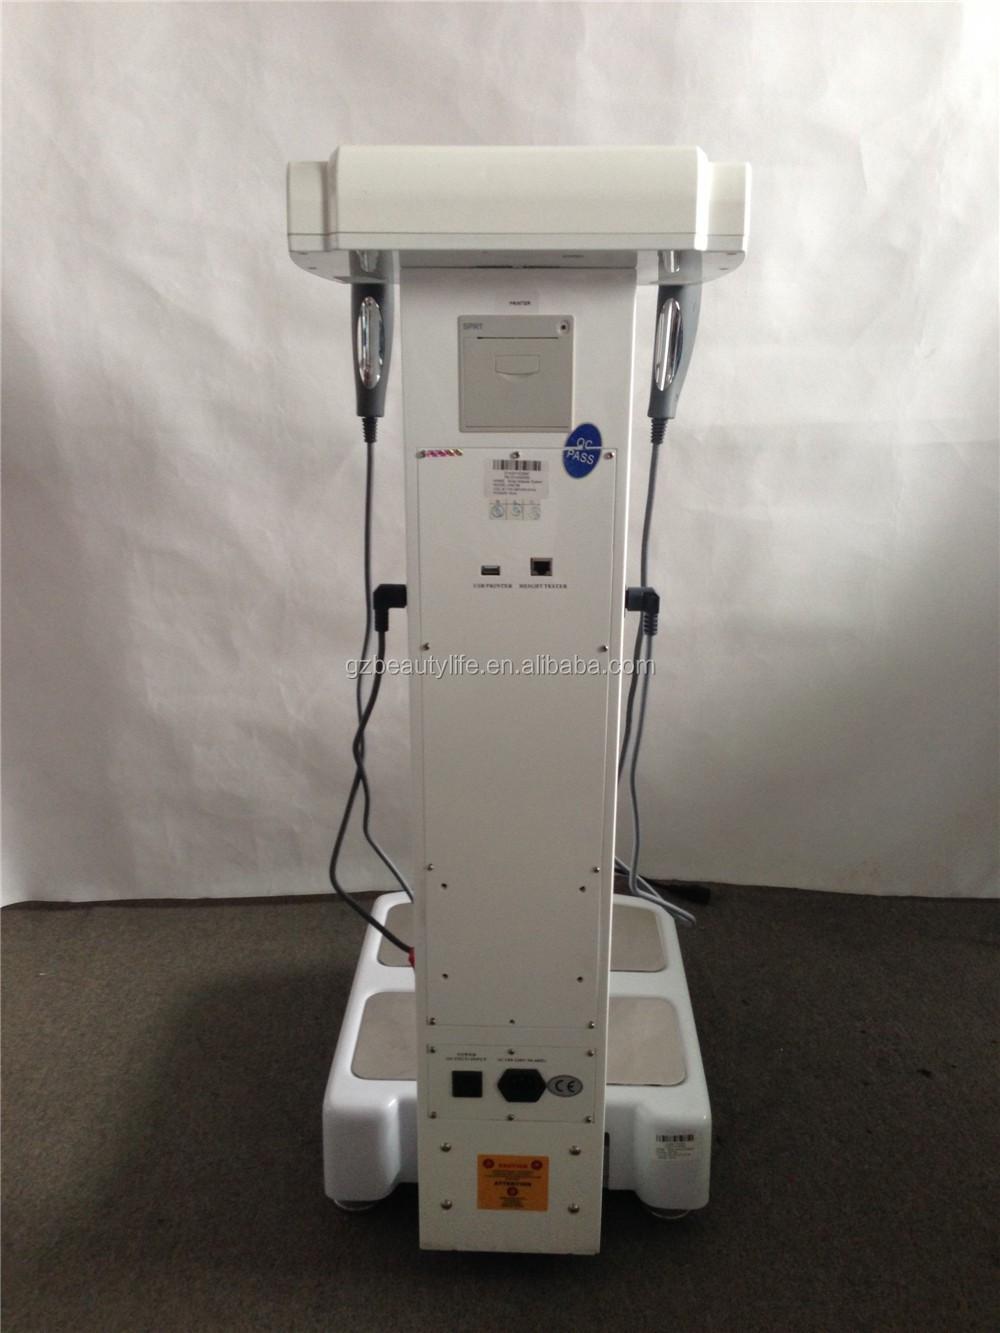 Insan vücudu eleman analizörü BL-H01fat ağırlık